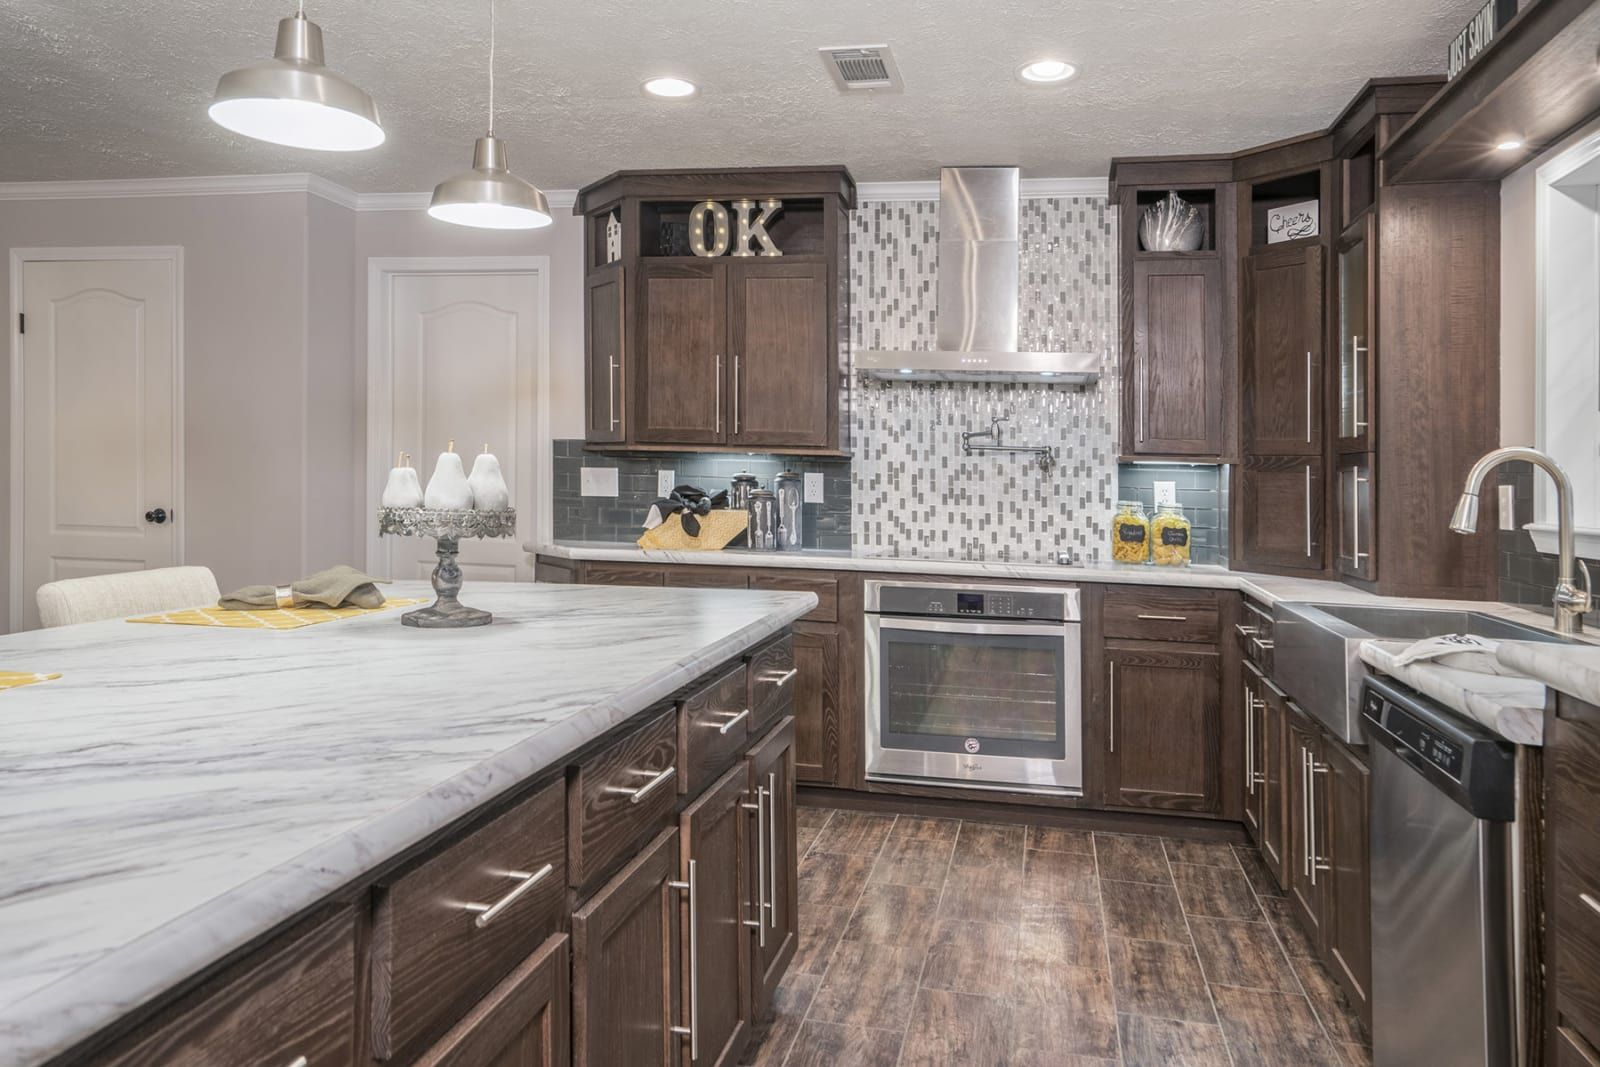 Kitchen with dark wood floors, stainless steel